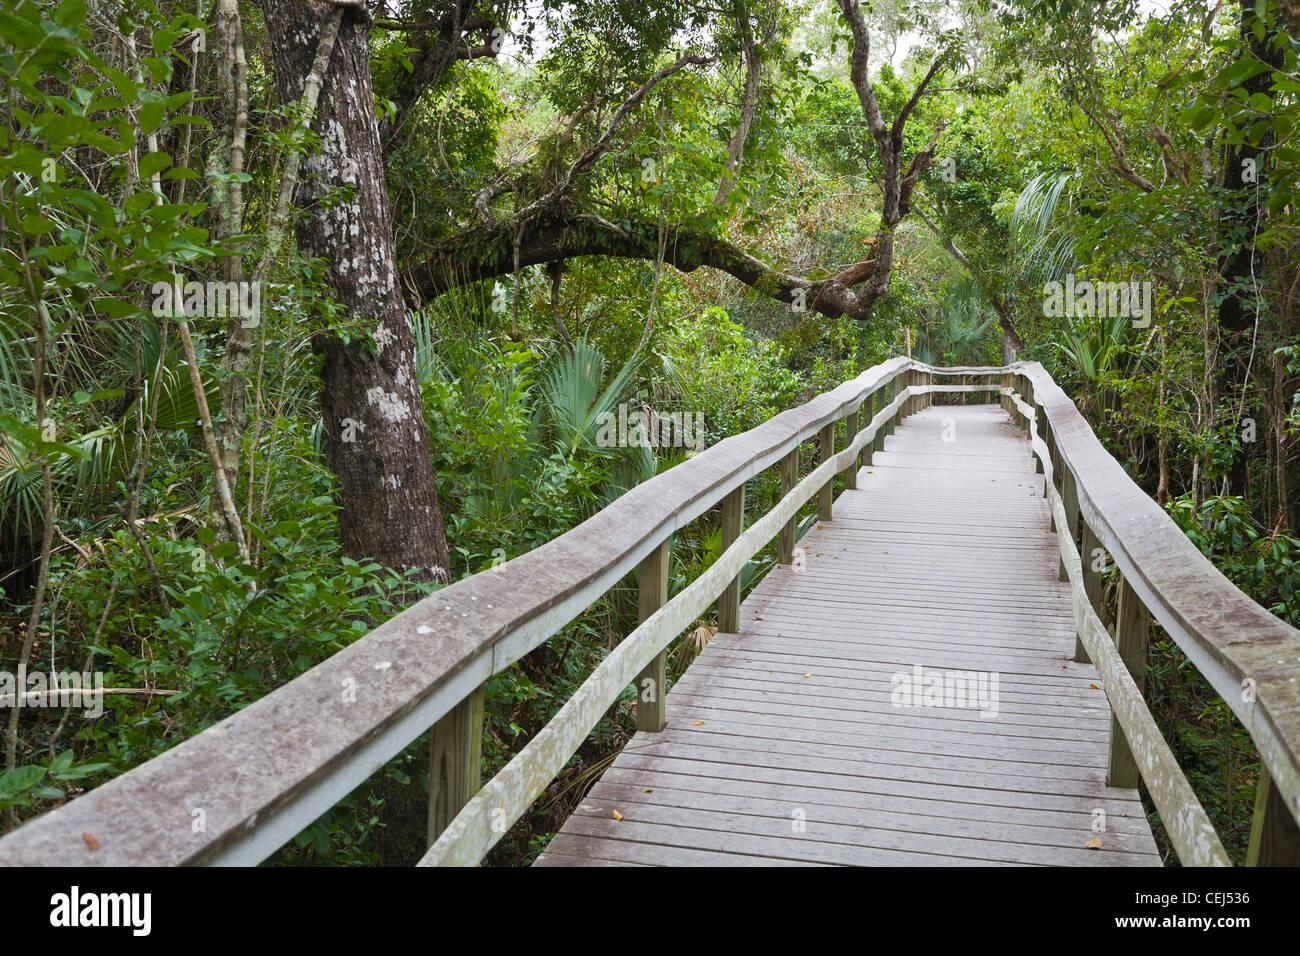 Boardwalk on Mahogany Hammock trail in the Everglades National Park Florida - Stock Image